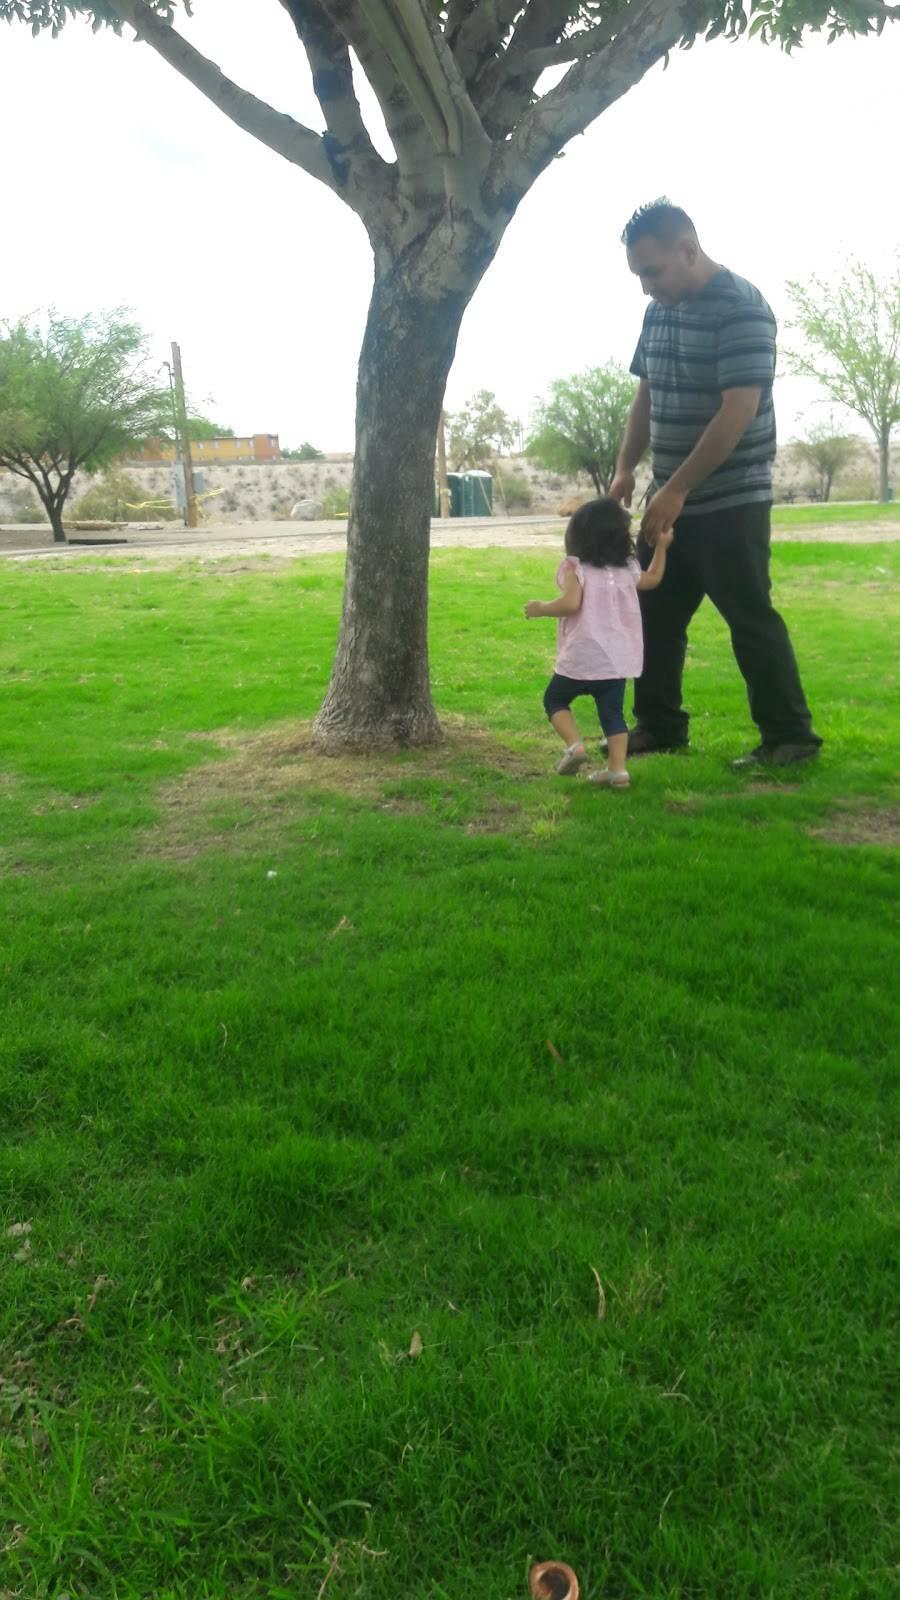 Westside Park - park  | Photo 6 of 10 | Address: 650 Wallenberg Dr, El Paso, TX 79912, USA | Phone: (915) 858-1929